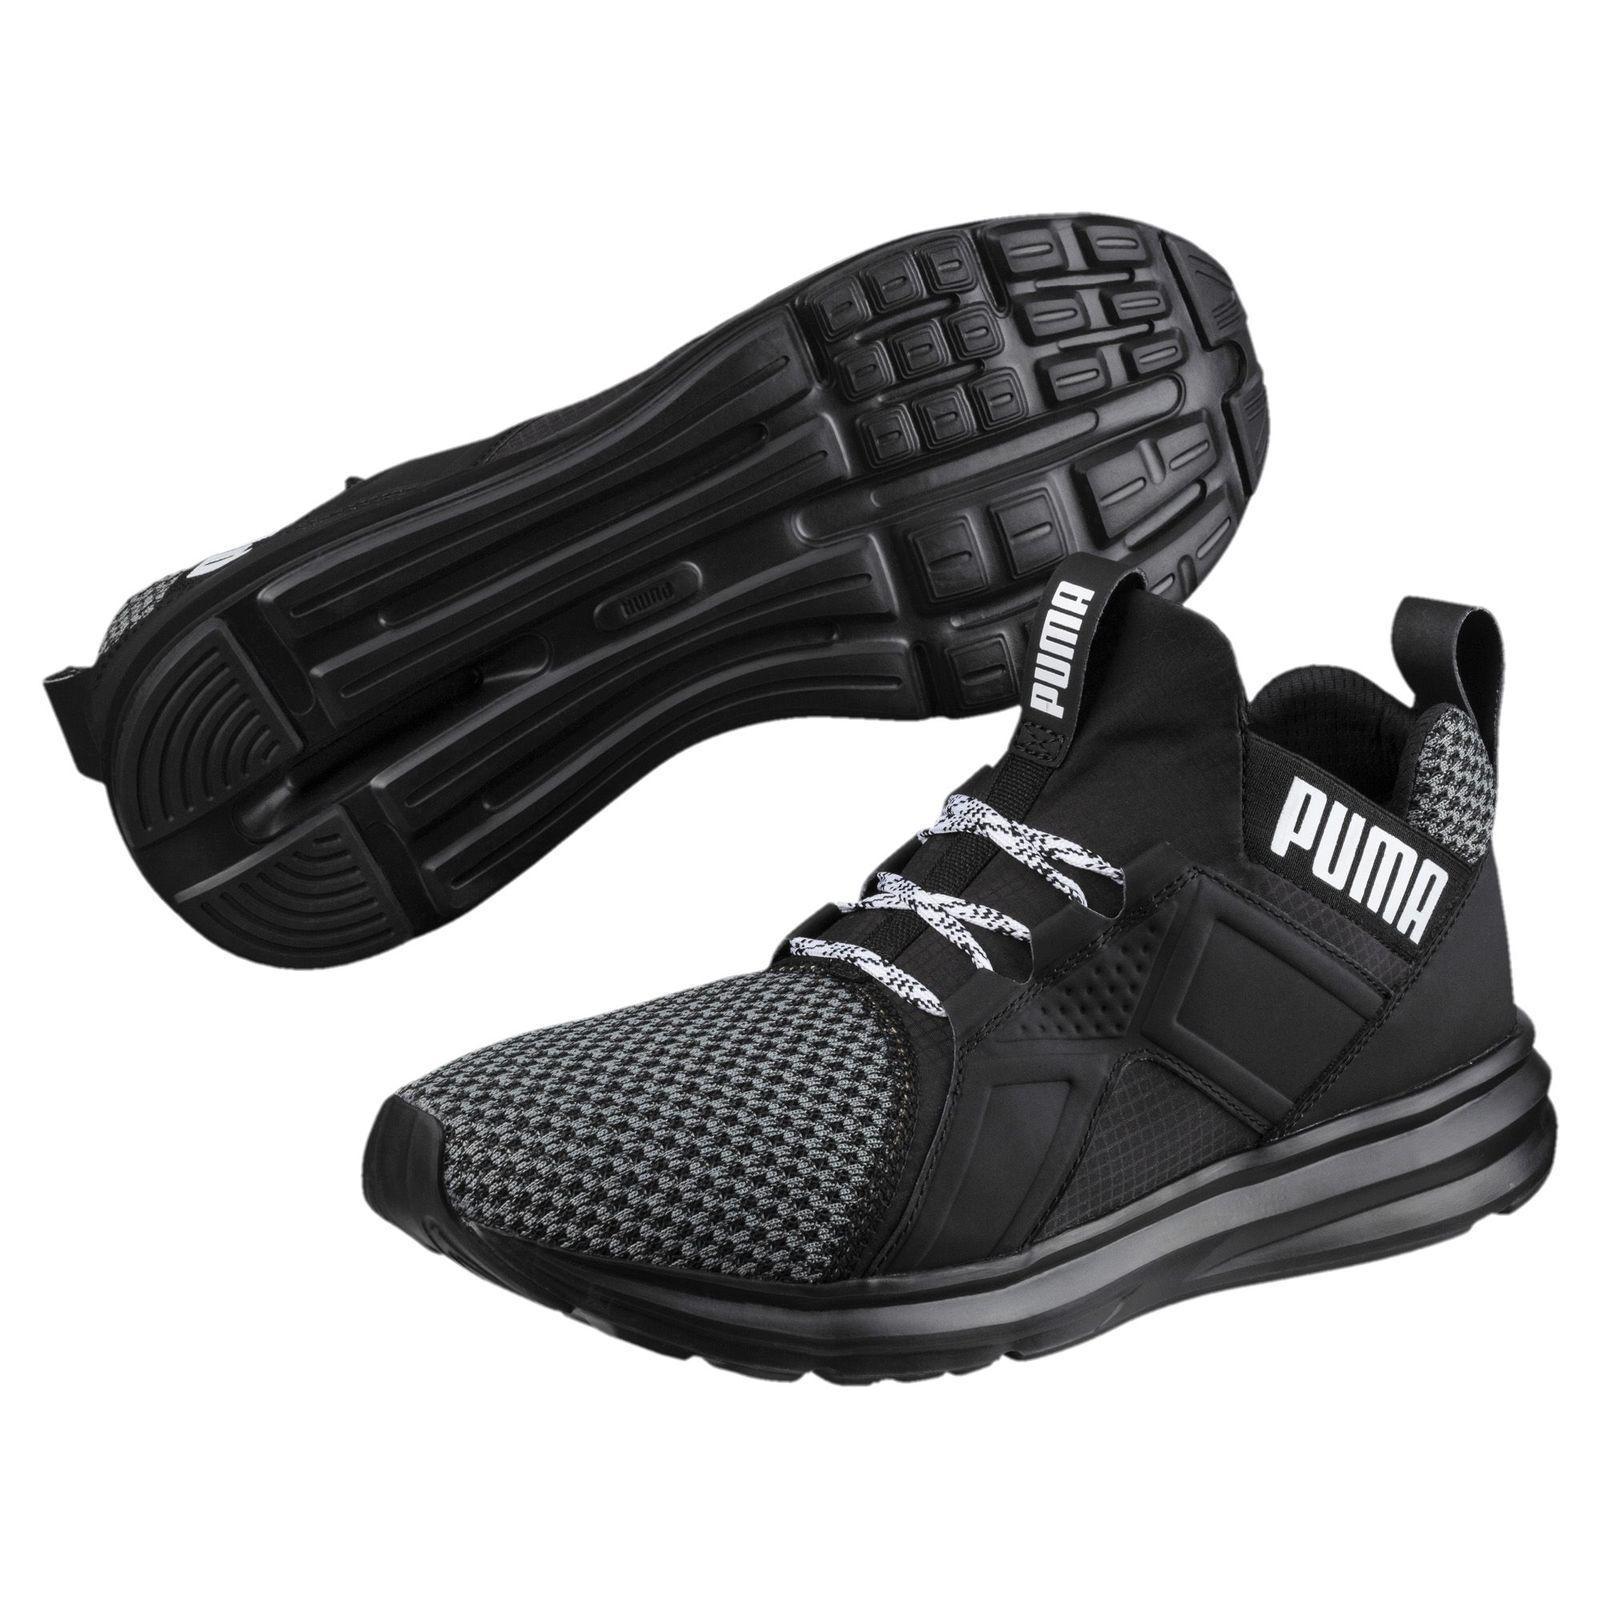 e326cb34c0c4 PUMA Enzo Terrain Men s Sneakers